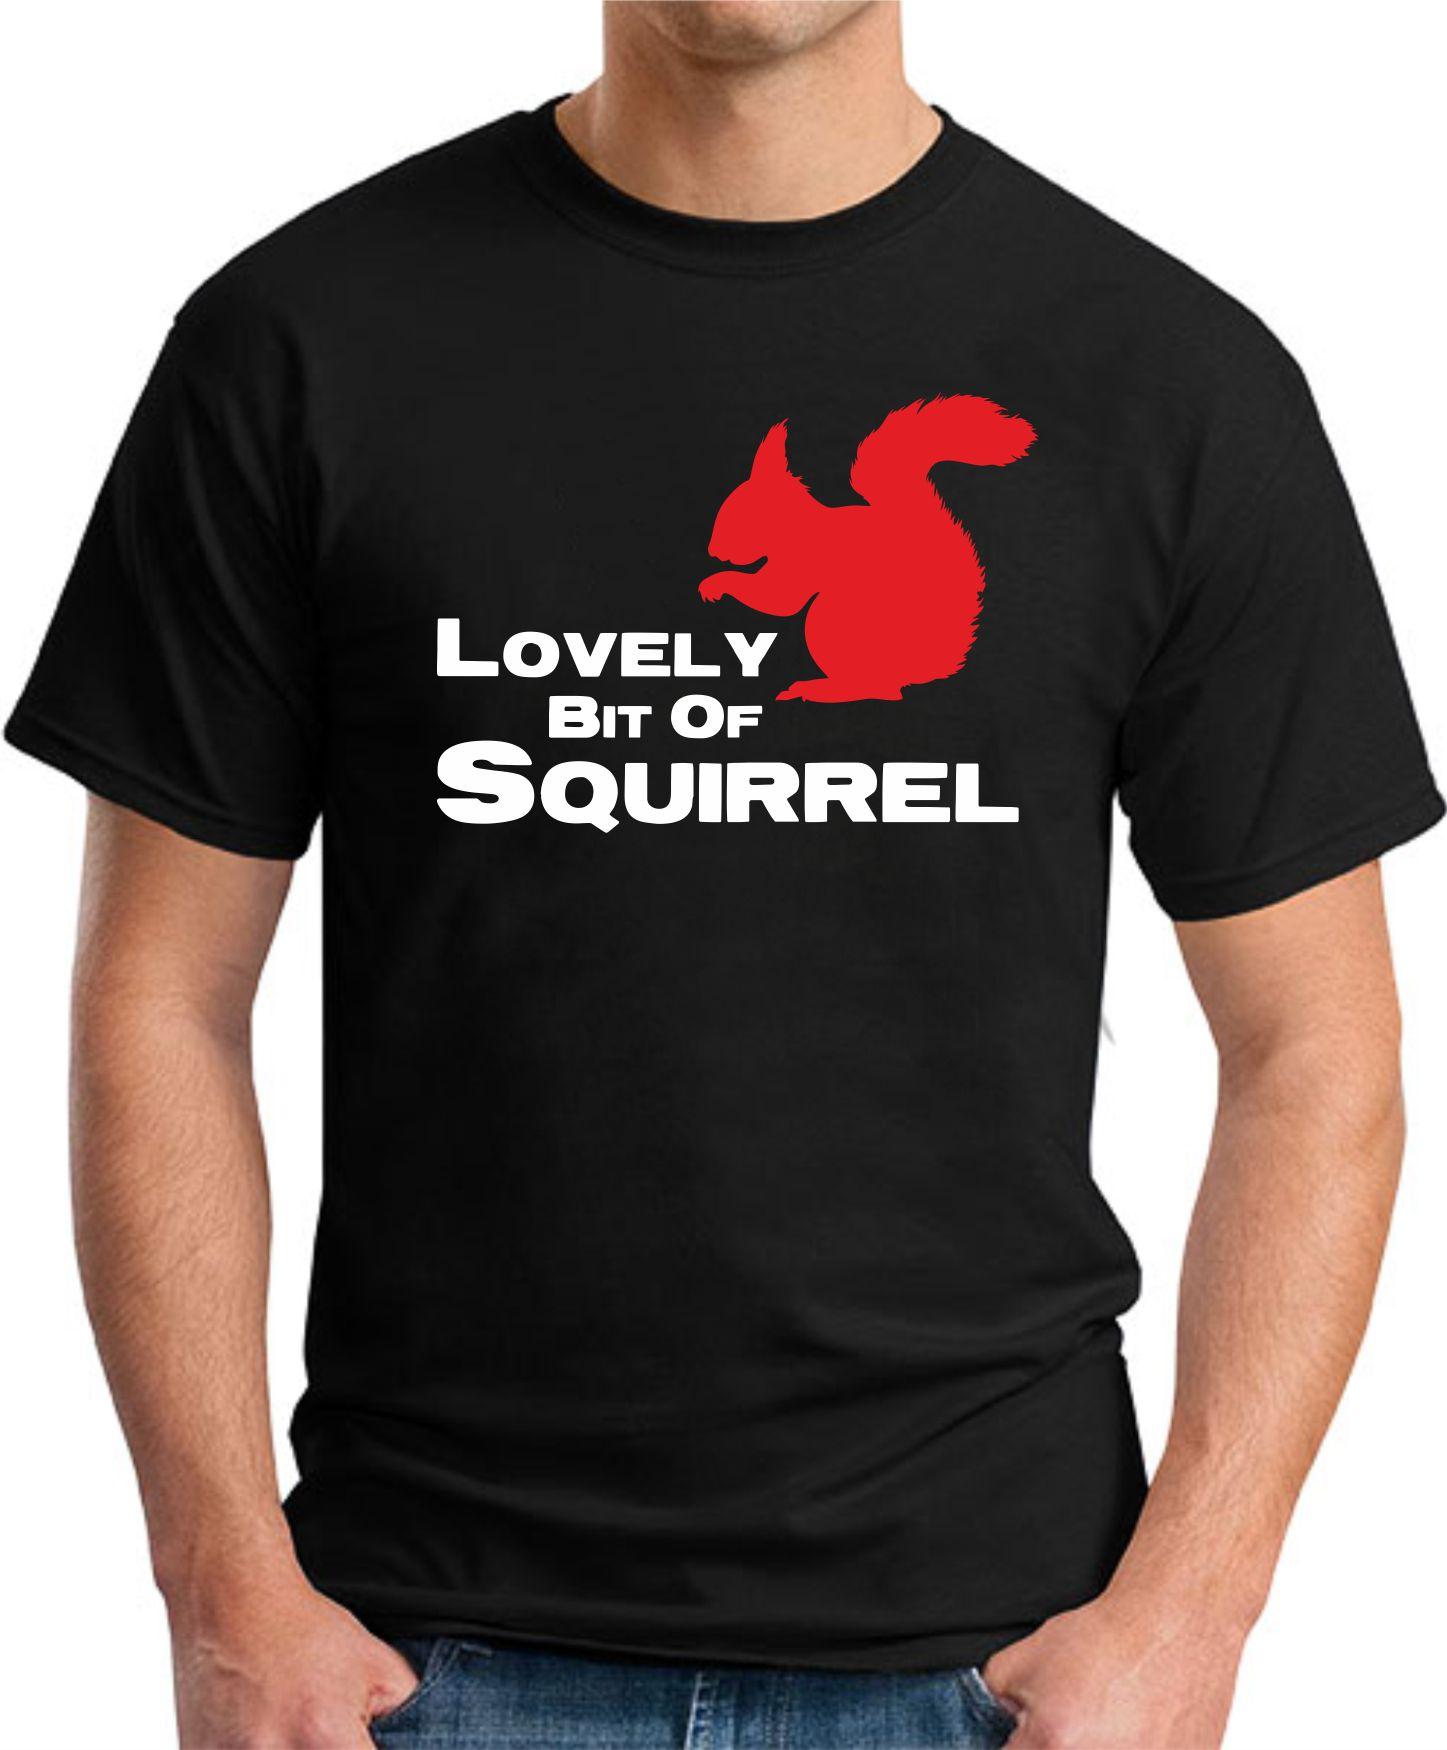 LOVELY BIT OF SQUIRREL black